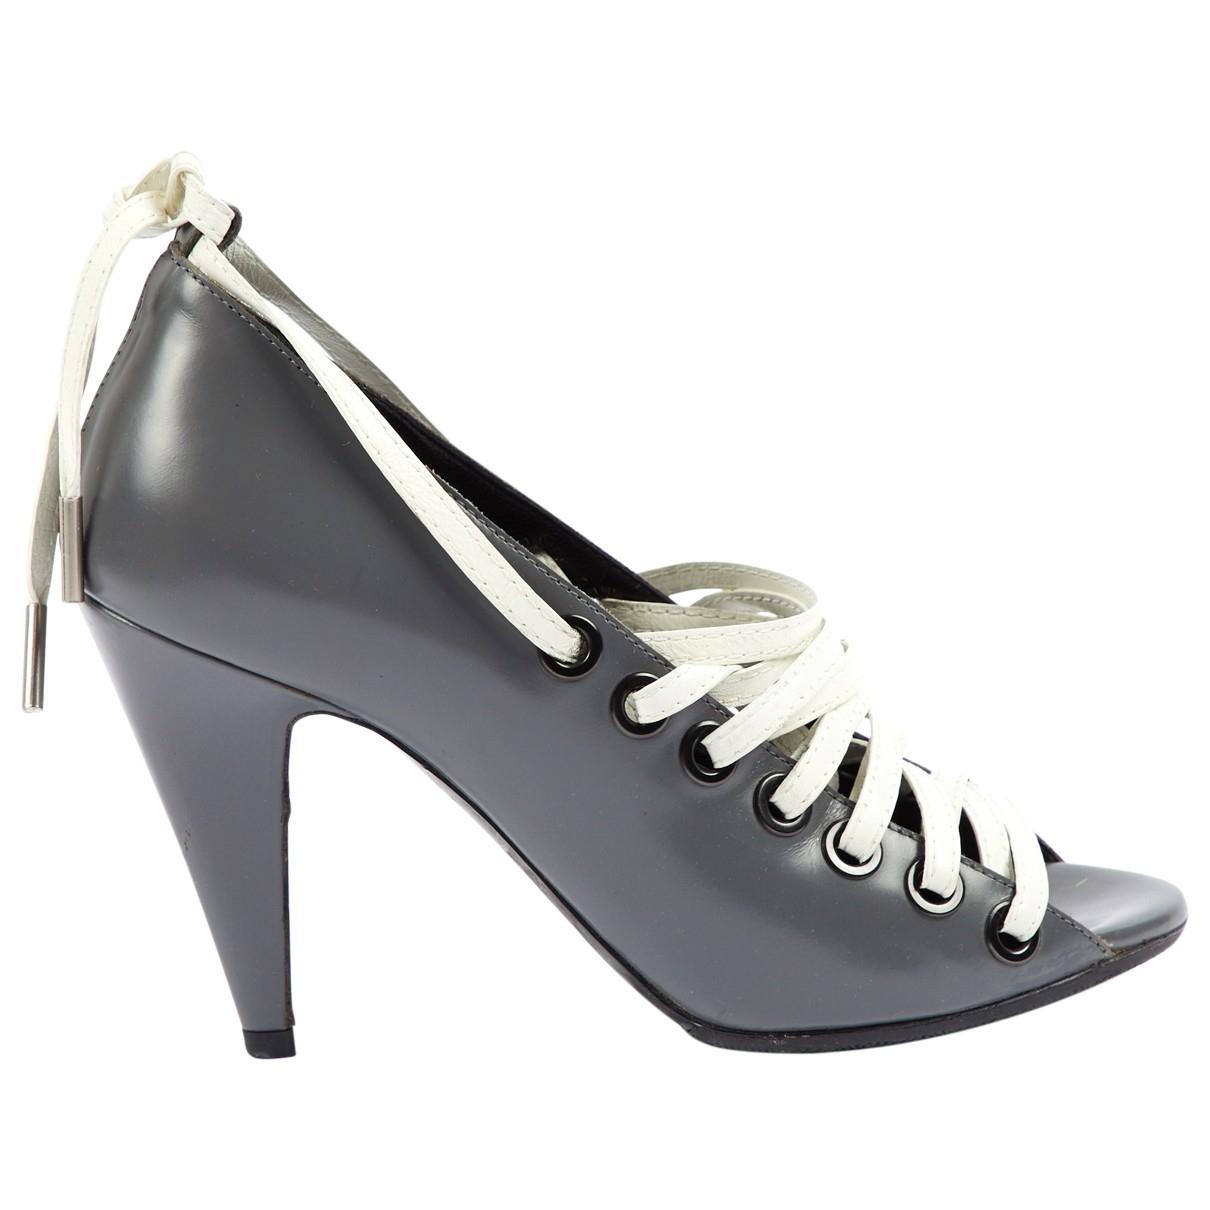 Balenciaga \N Pumps in  Grau Leder